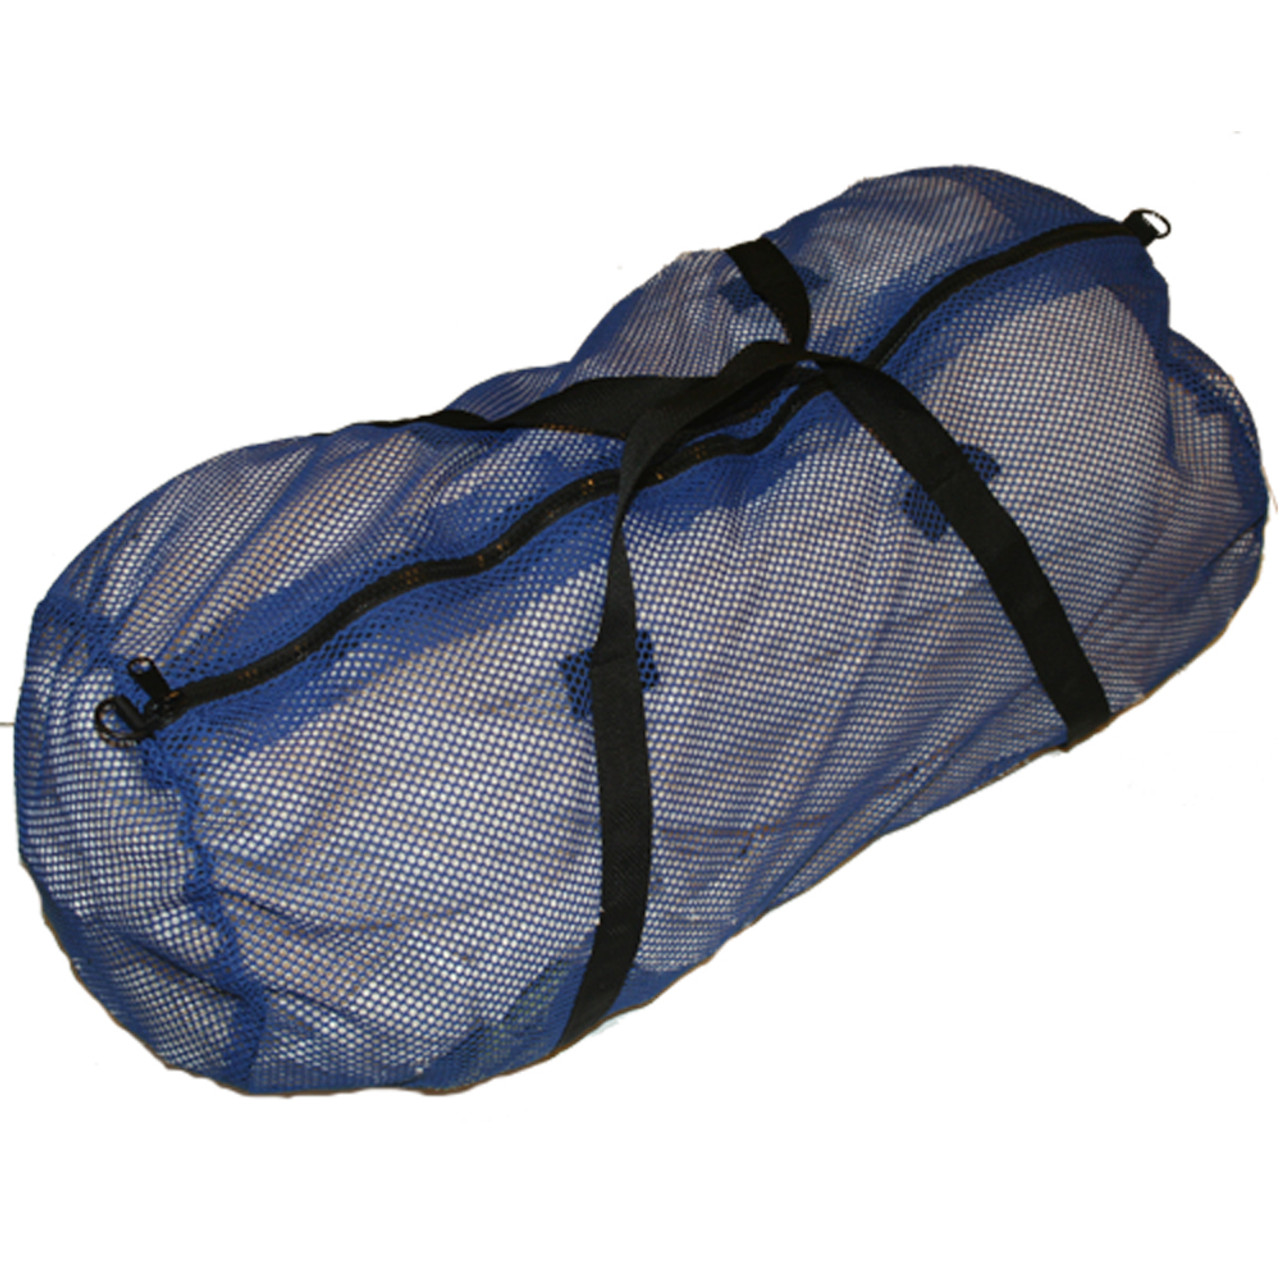 Nylon Mesh Gear Bag, 15inch x 34inch, Large